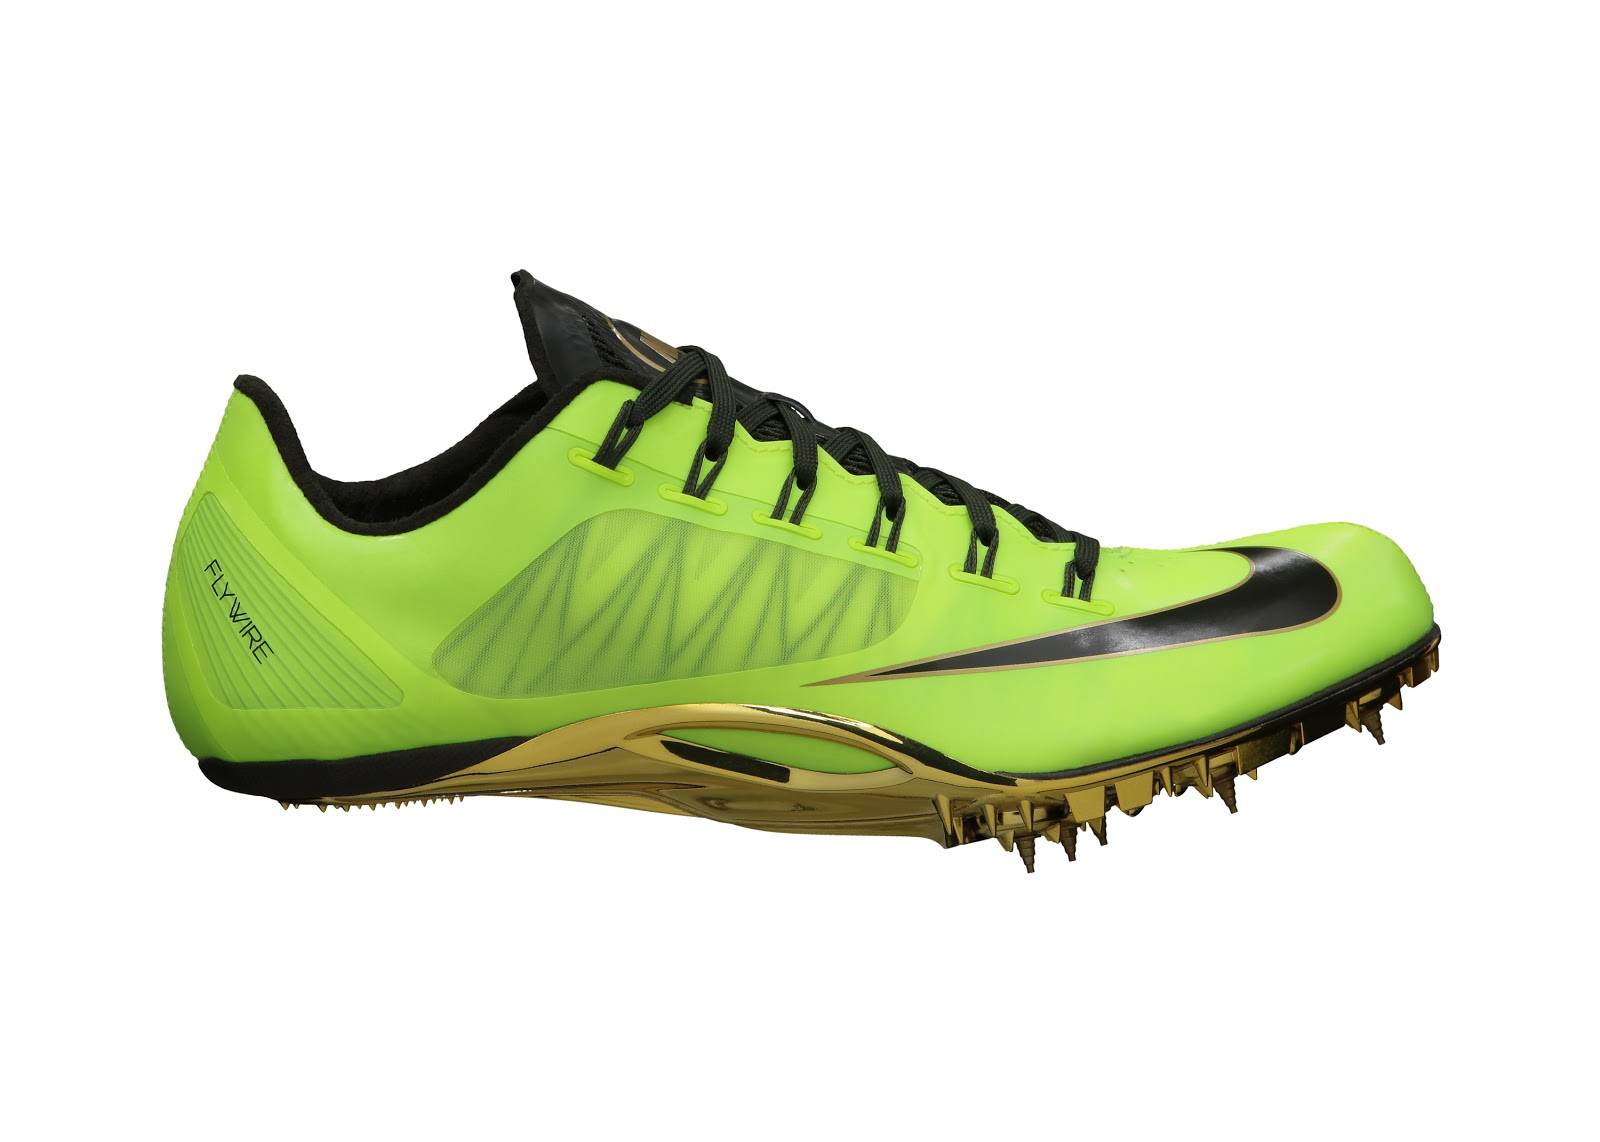 0b65a56a83cfd4 Jordan Stock Price Best Running Shoes Nike Free